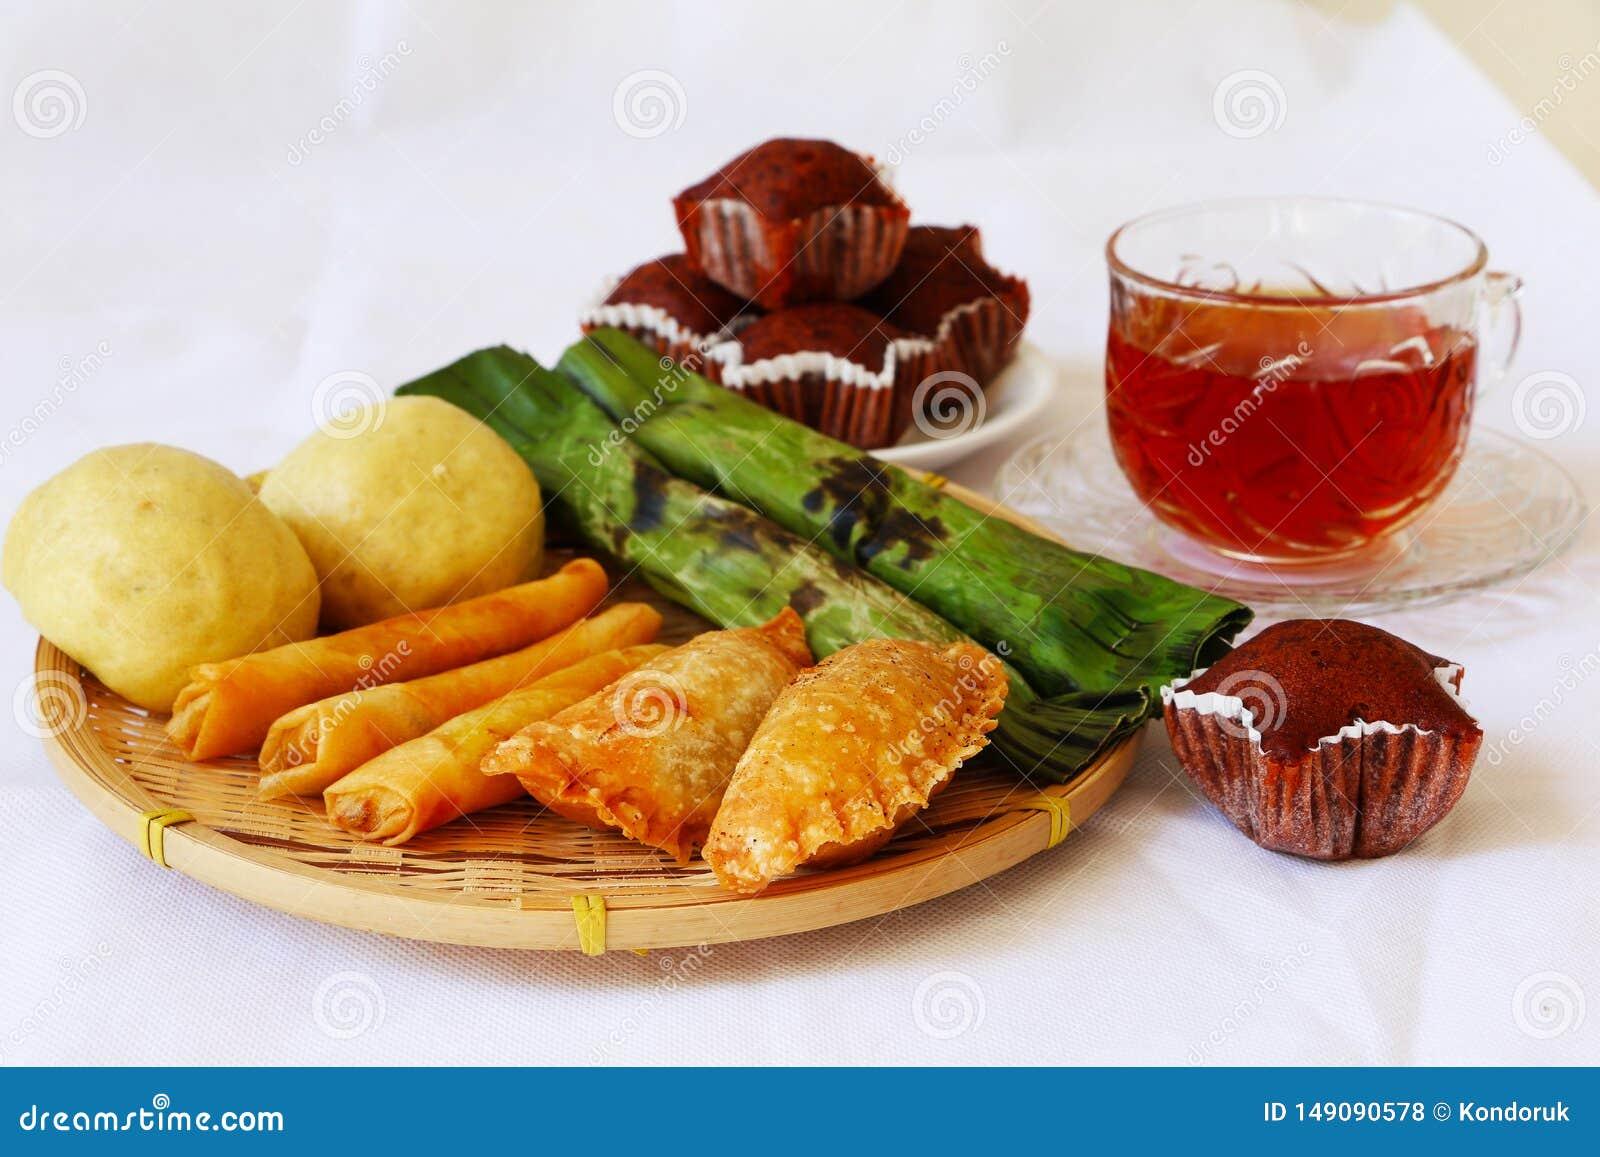 Malaysian Traditional Cakes Kuih Muih Stock Photo Image Of Served Traditional 149090578